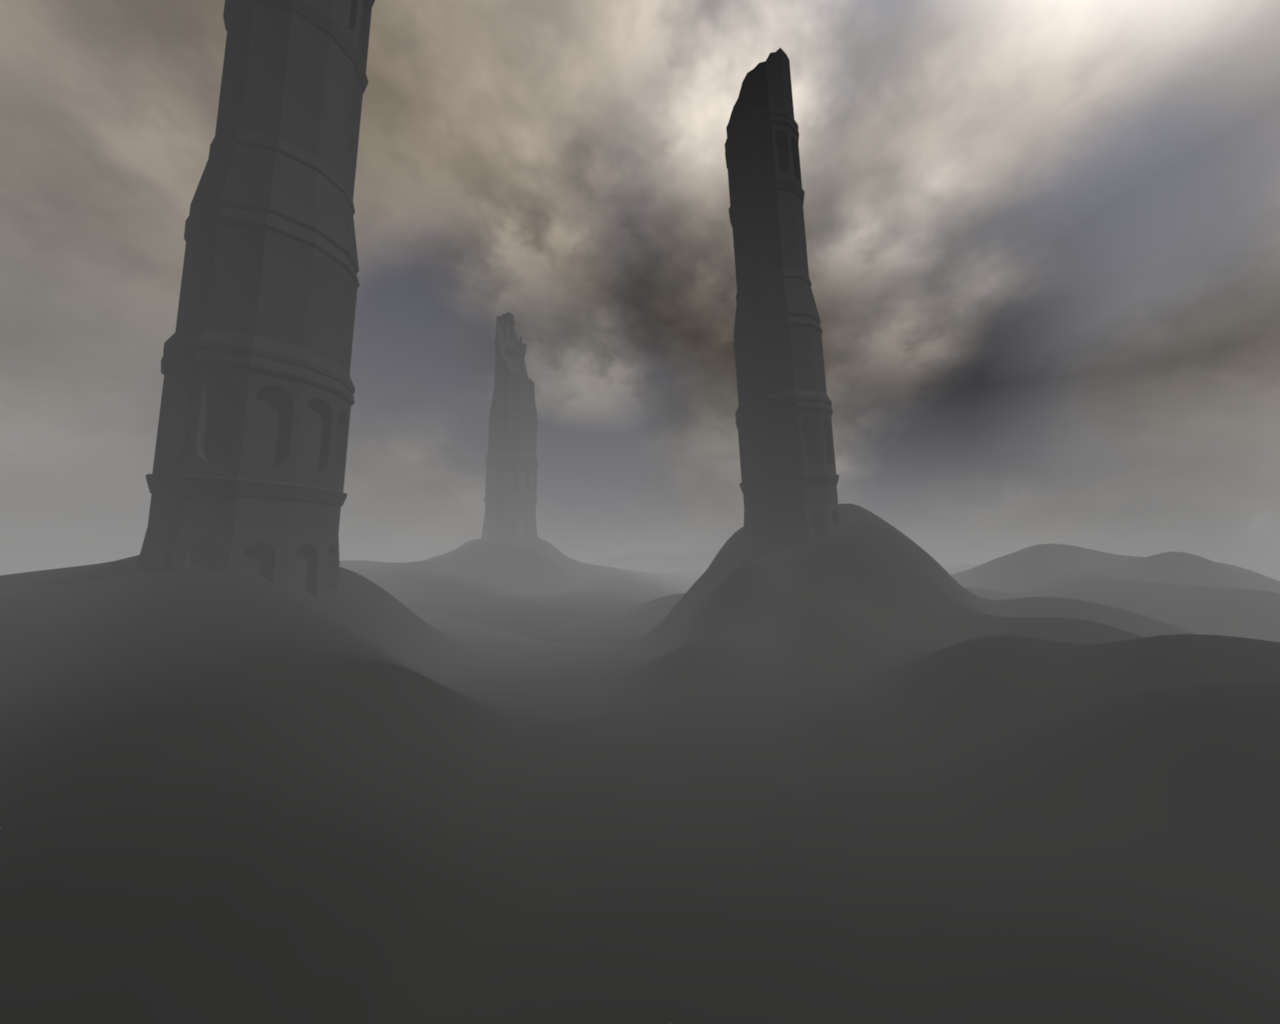 tower ruins by panzi